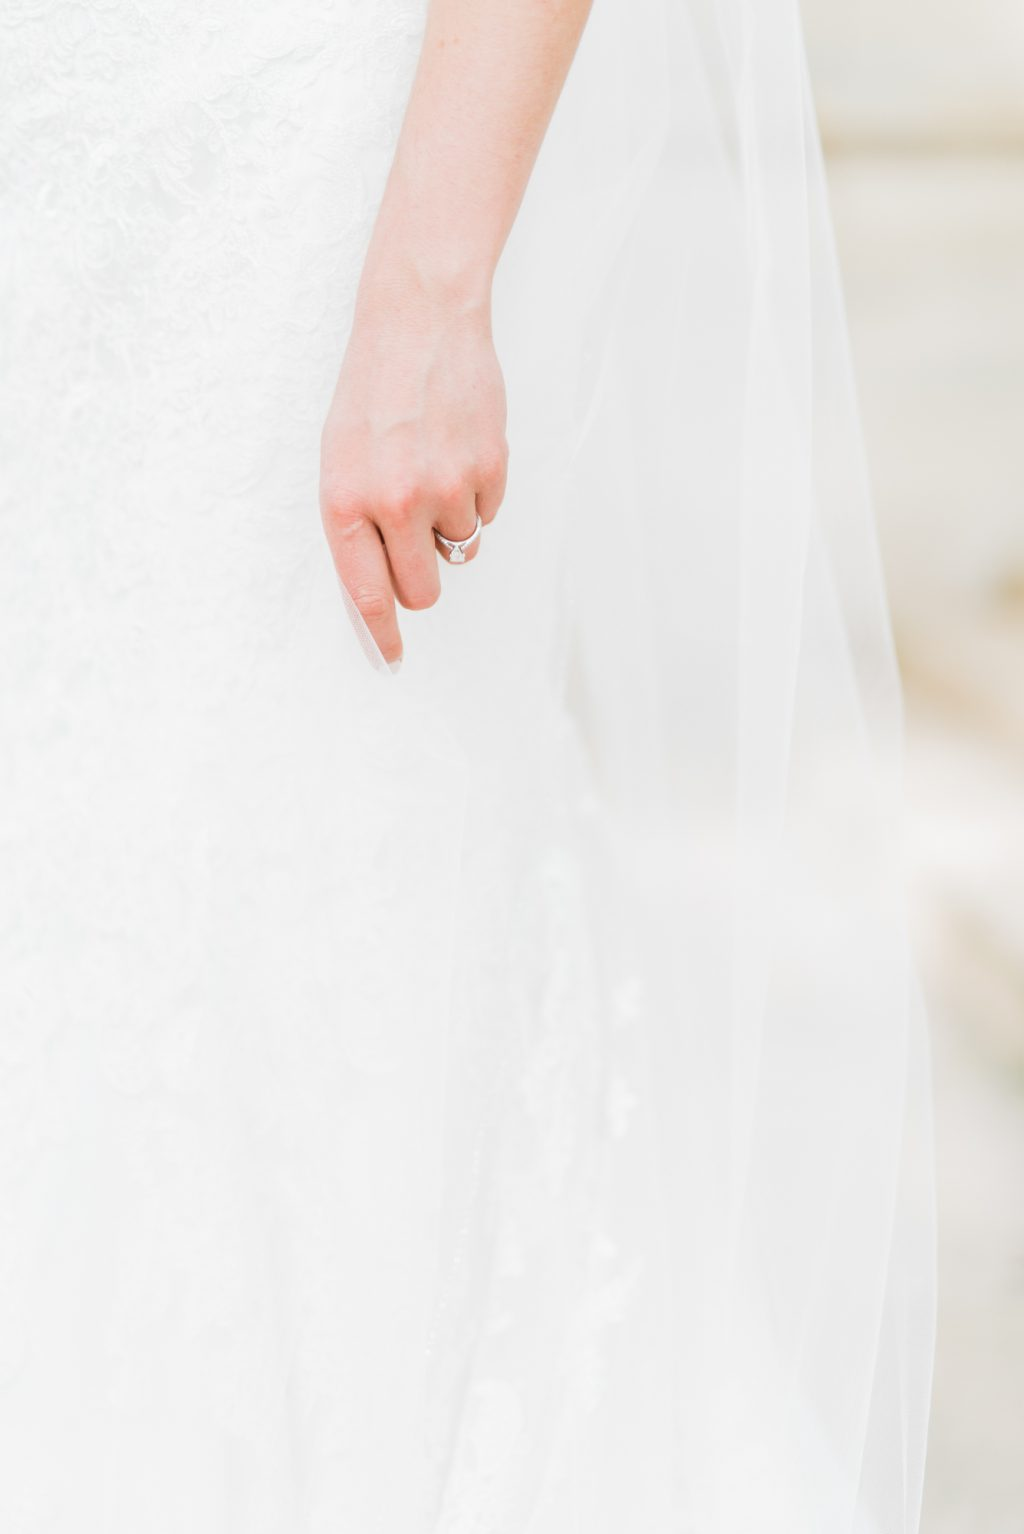 haleyrichterphoto-front-and-palmer-spring-wedding-rodin-museum-loews-hotel-philadelphia-098